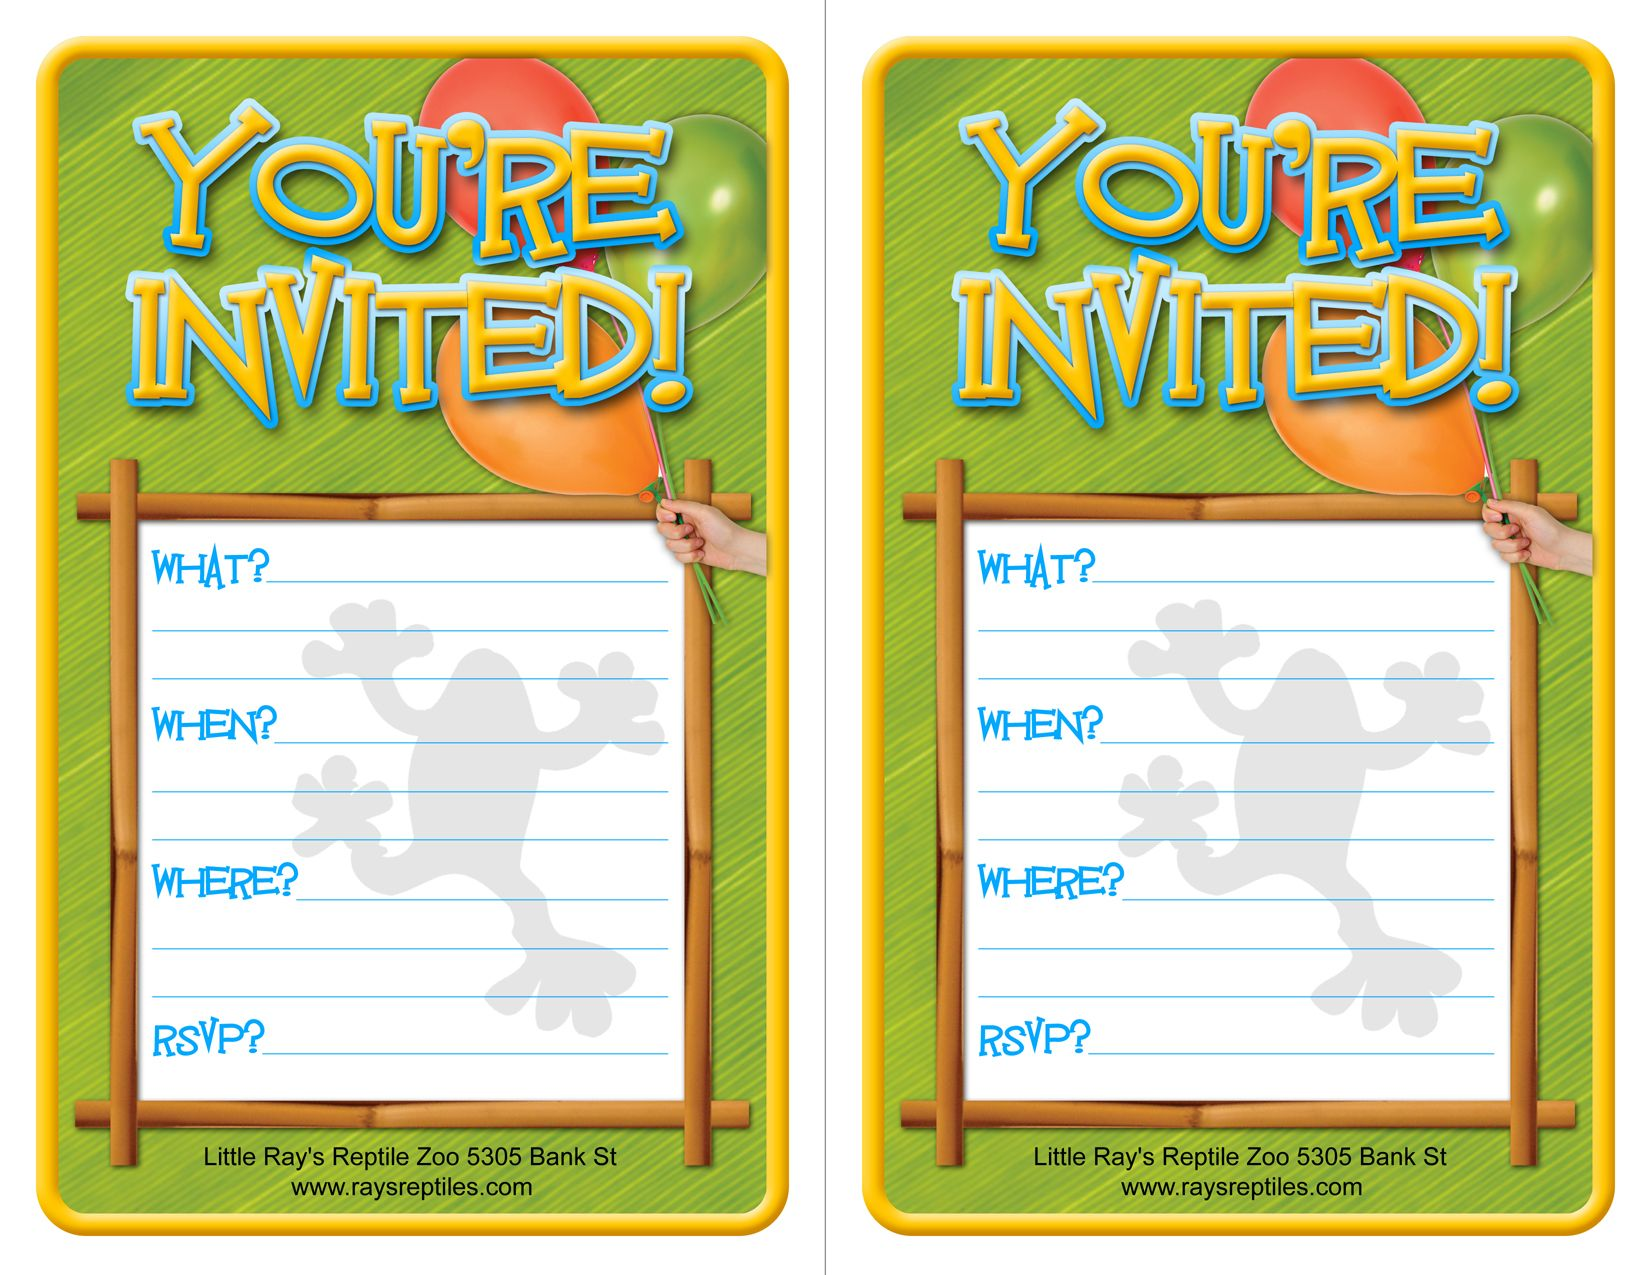 Party Invitation Wording Zazzle Au 65th Birthday Party – Reptile Invitations Birthday